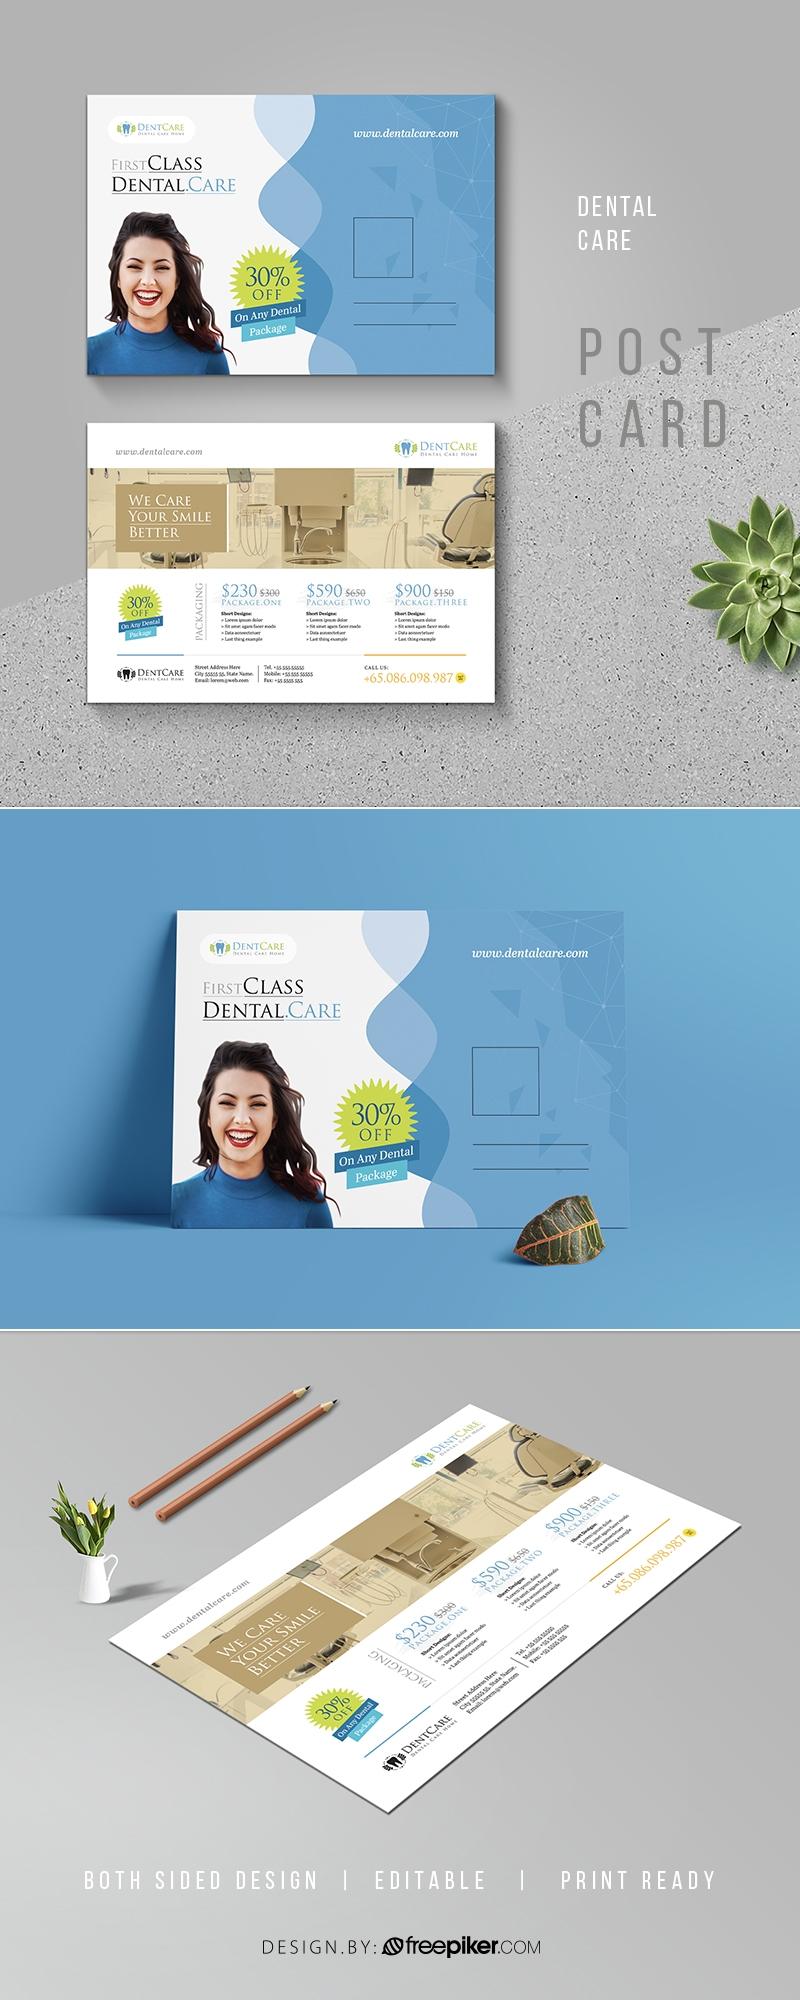 Dental Care Clinic Dentist Service Postcard